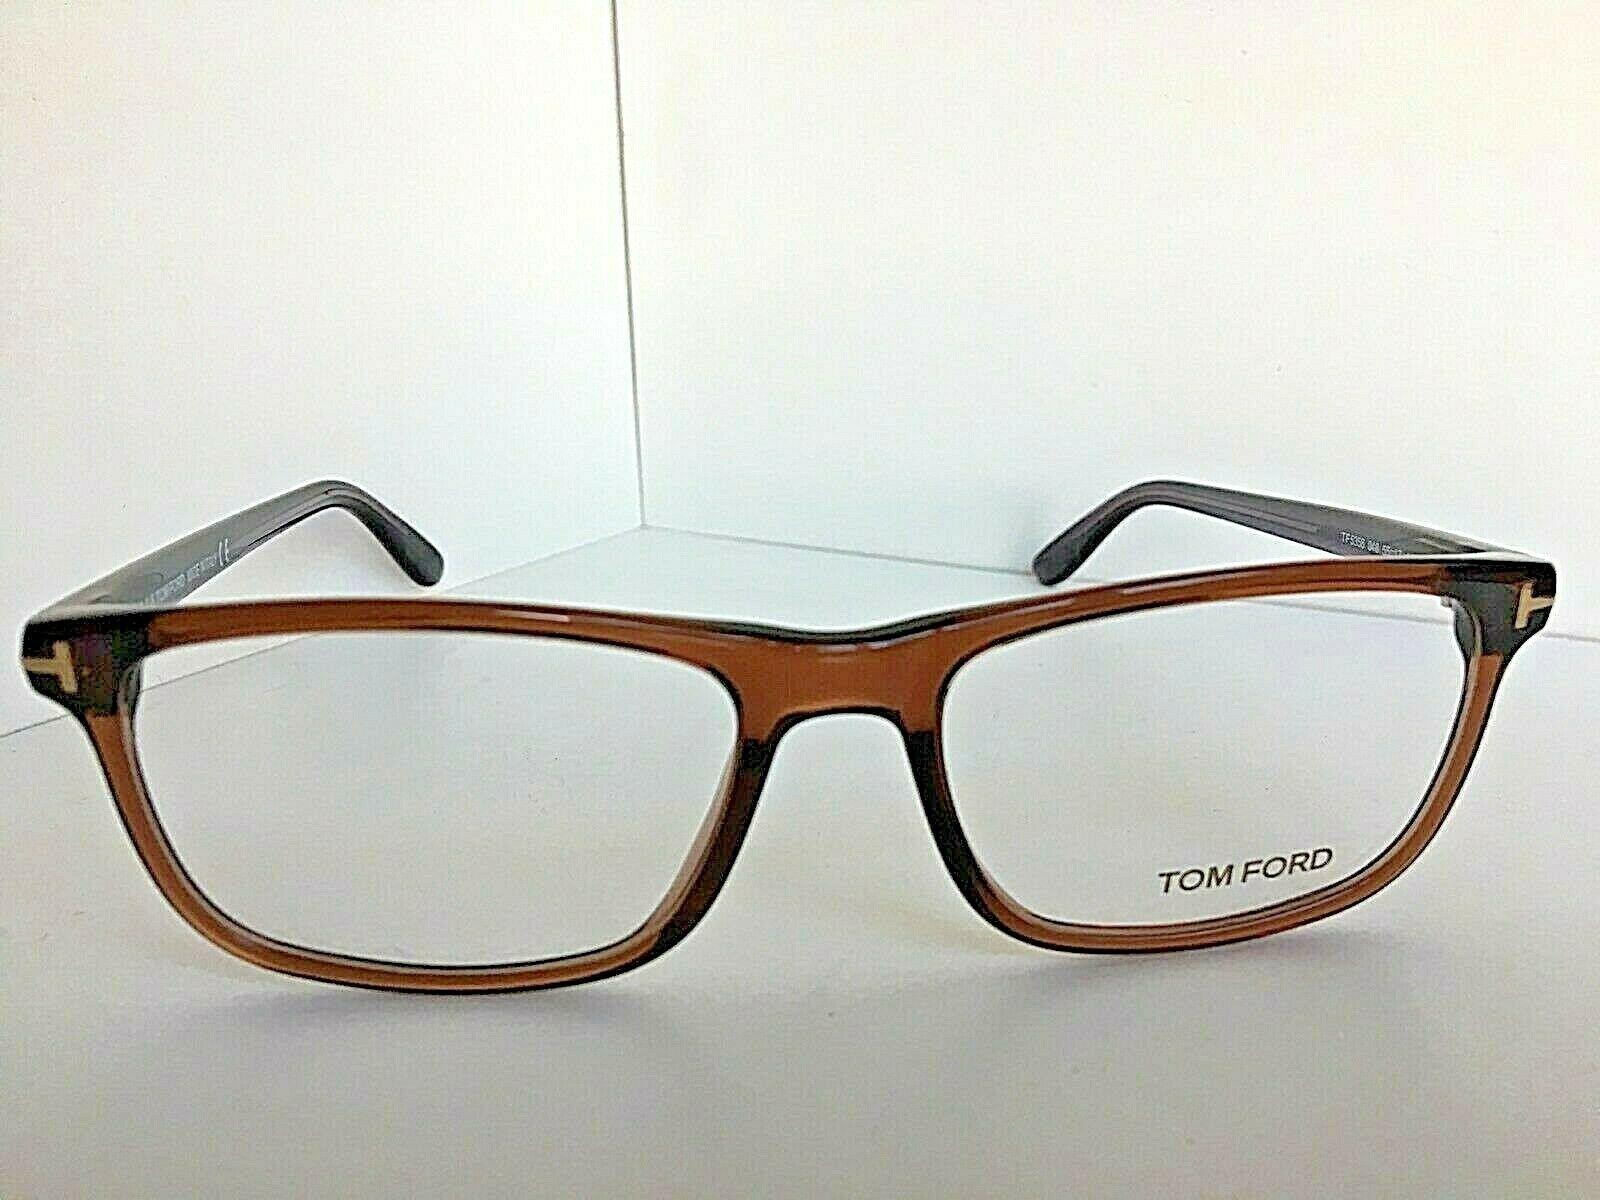 New Tom Ford TF 5356 55mm Transparent Brown Eyeglasses Frame Italy